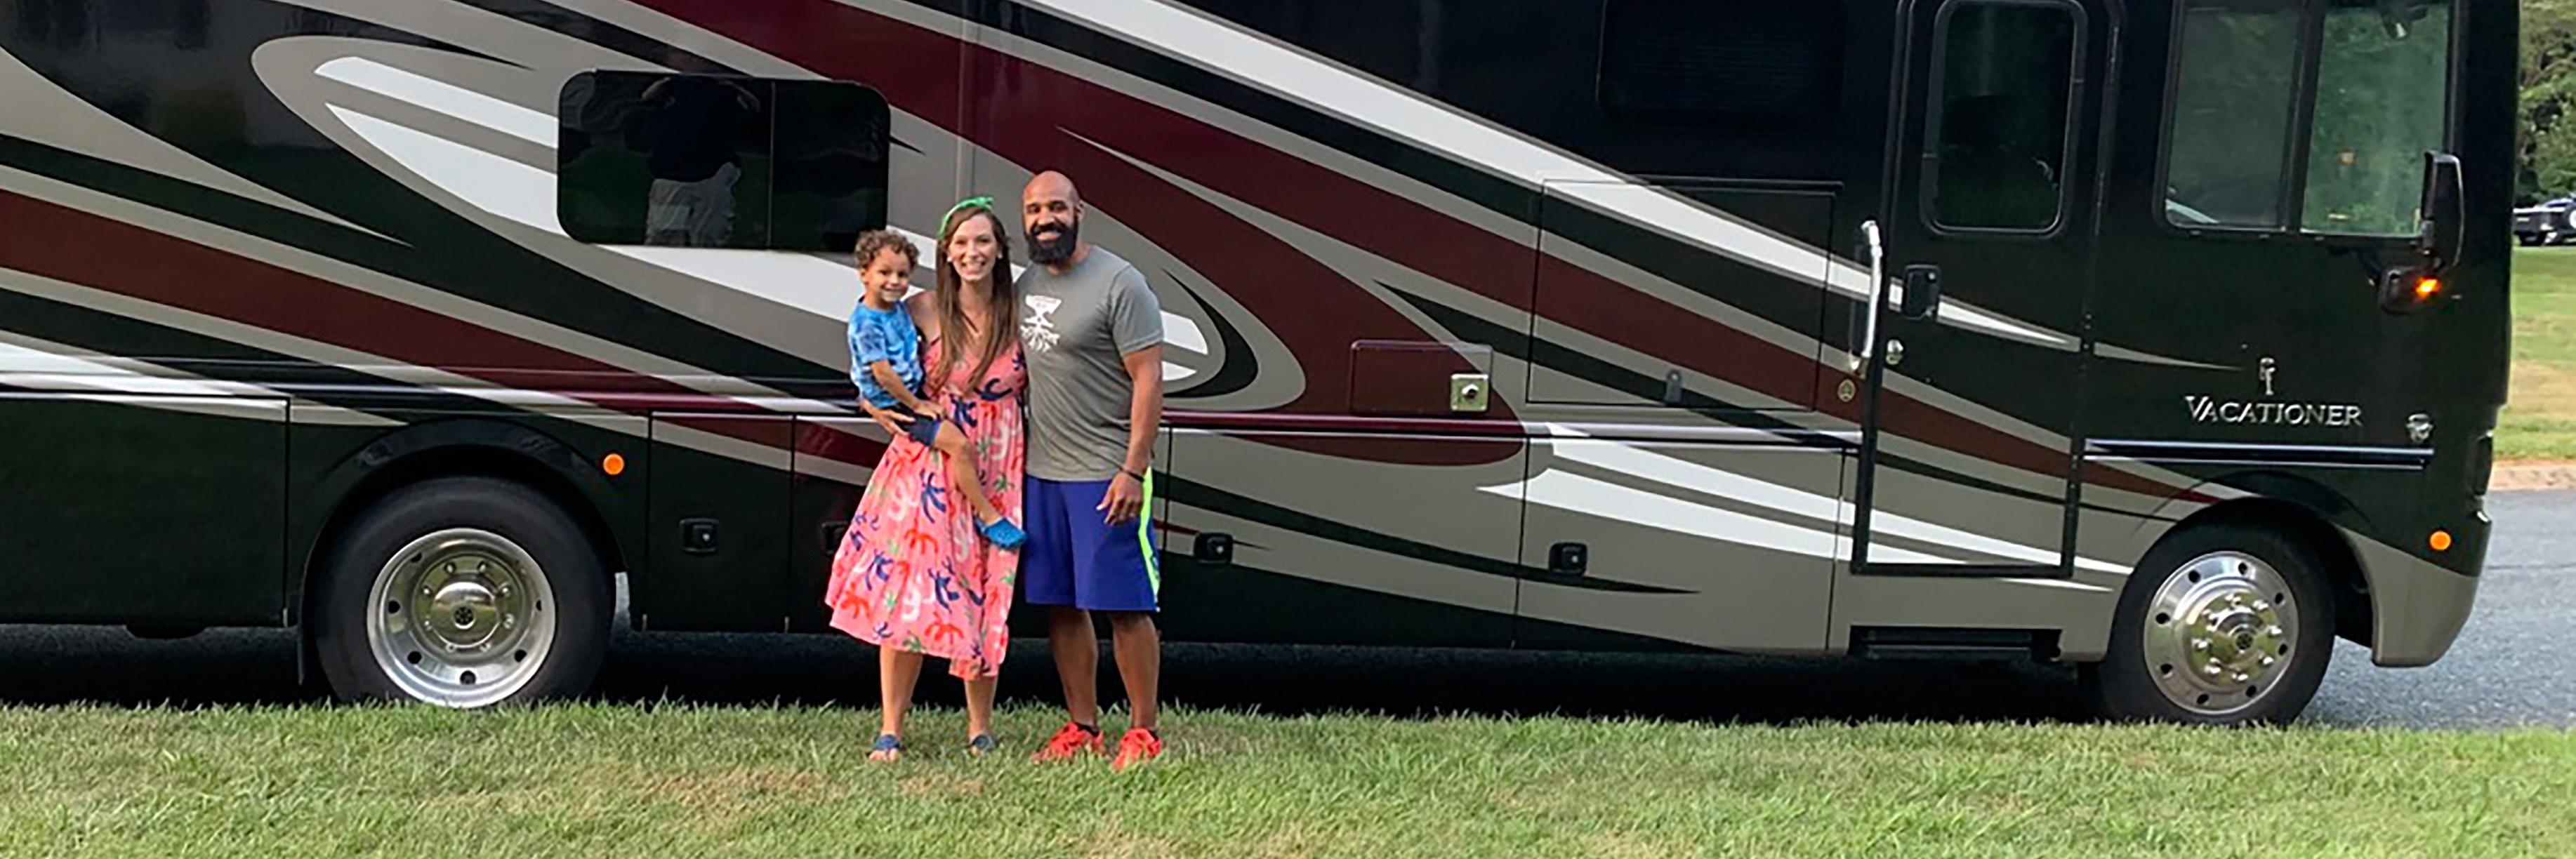 Adventurtunity Family Shares Video Diary of Full-Time RV Life